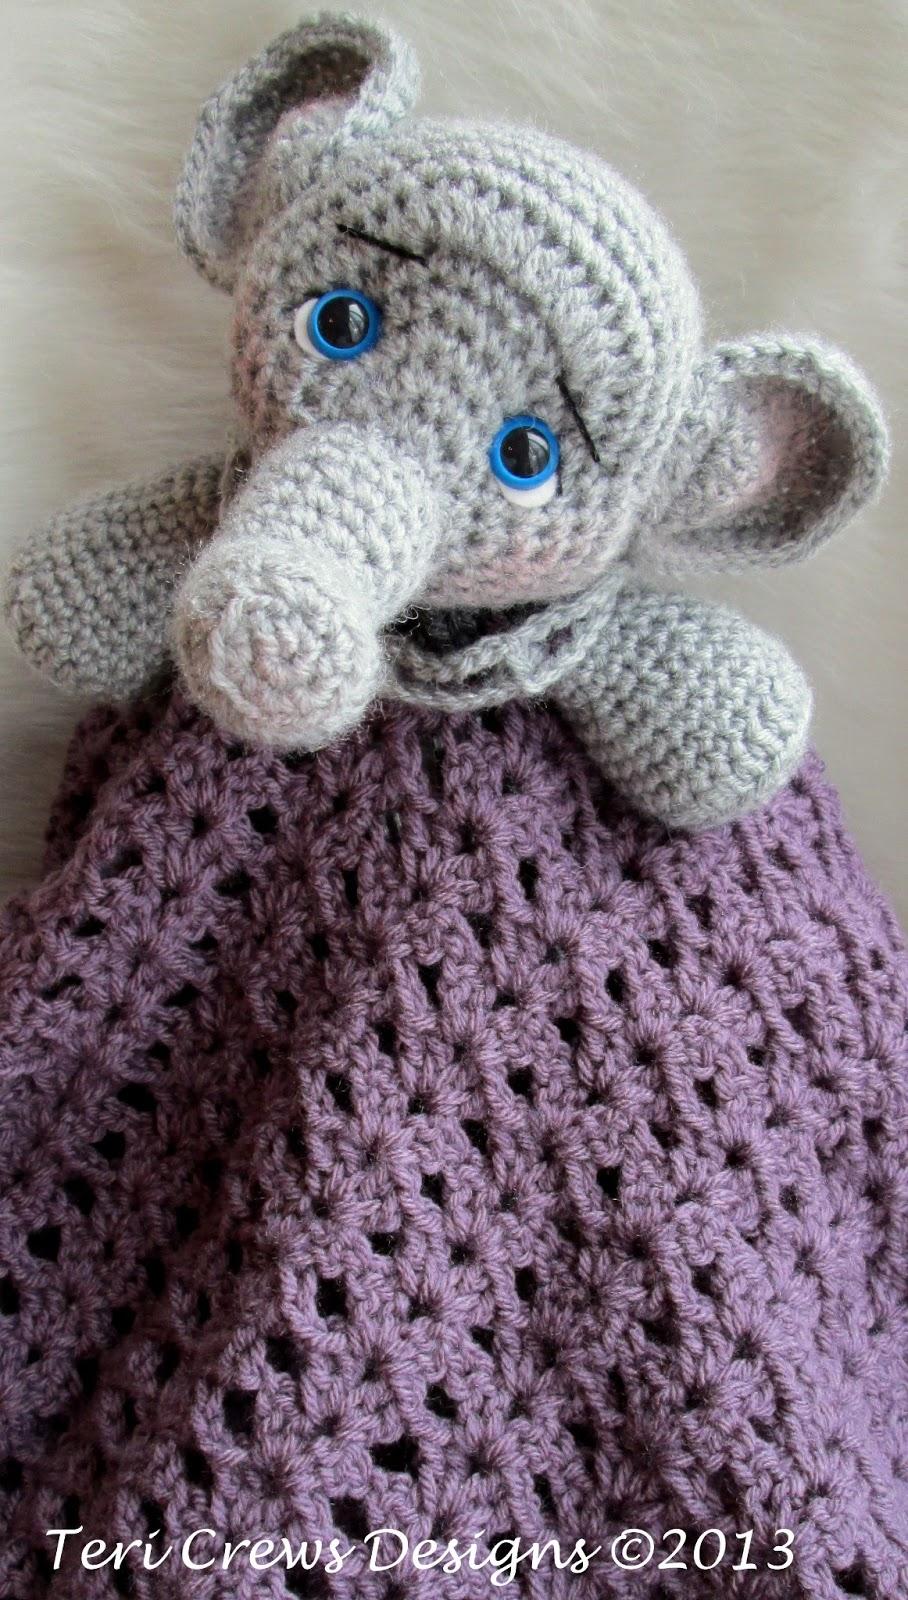 Teri\'s Blog: New Elephant Huggy Baby Blanket Pattern